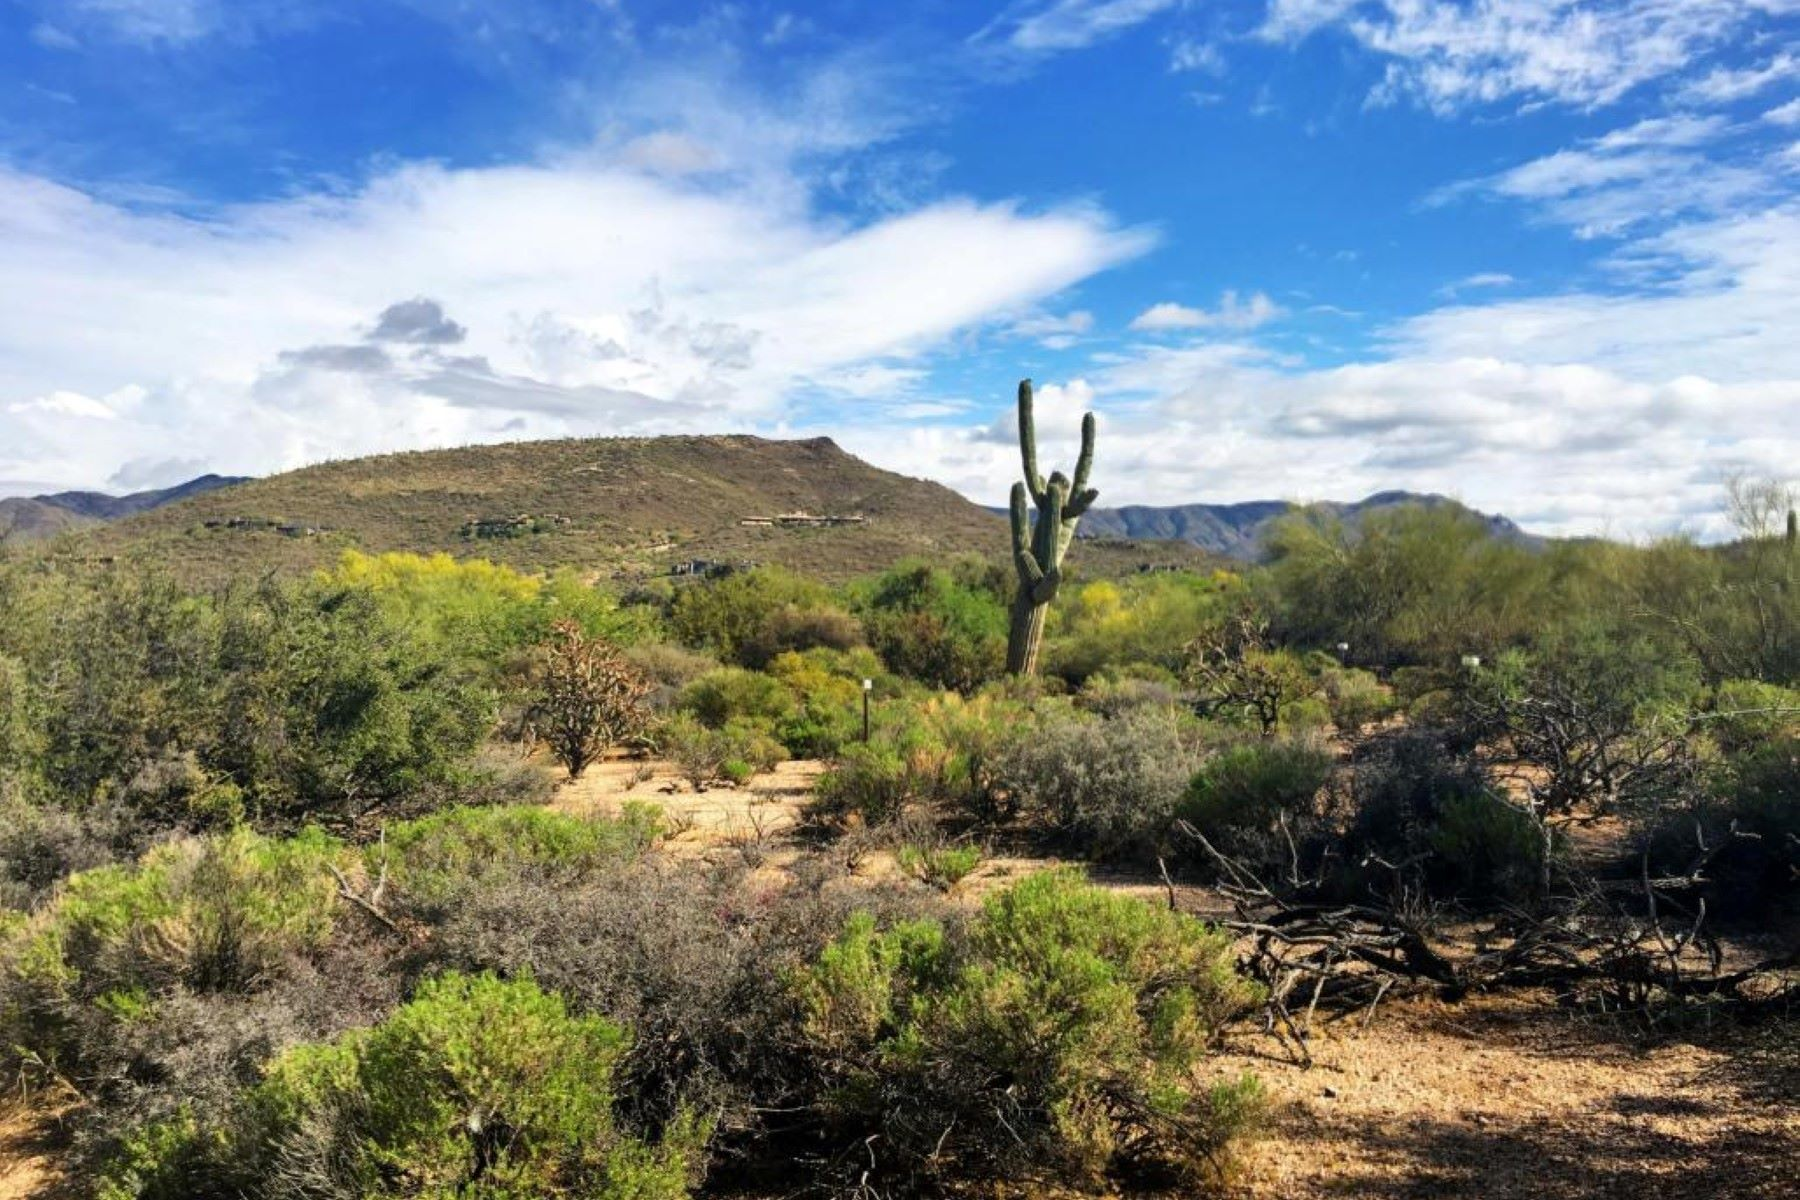 Terreno por un Venta en Homesite in Desert Mountain's Village of Gambel Quail 9396 E Sundance Trl #77 Scottsdale, Arizona, 85262 Estados Unidos